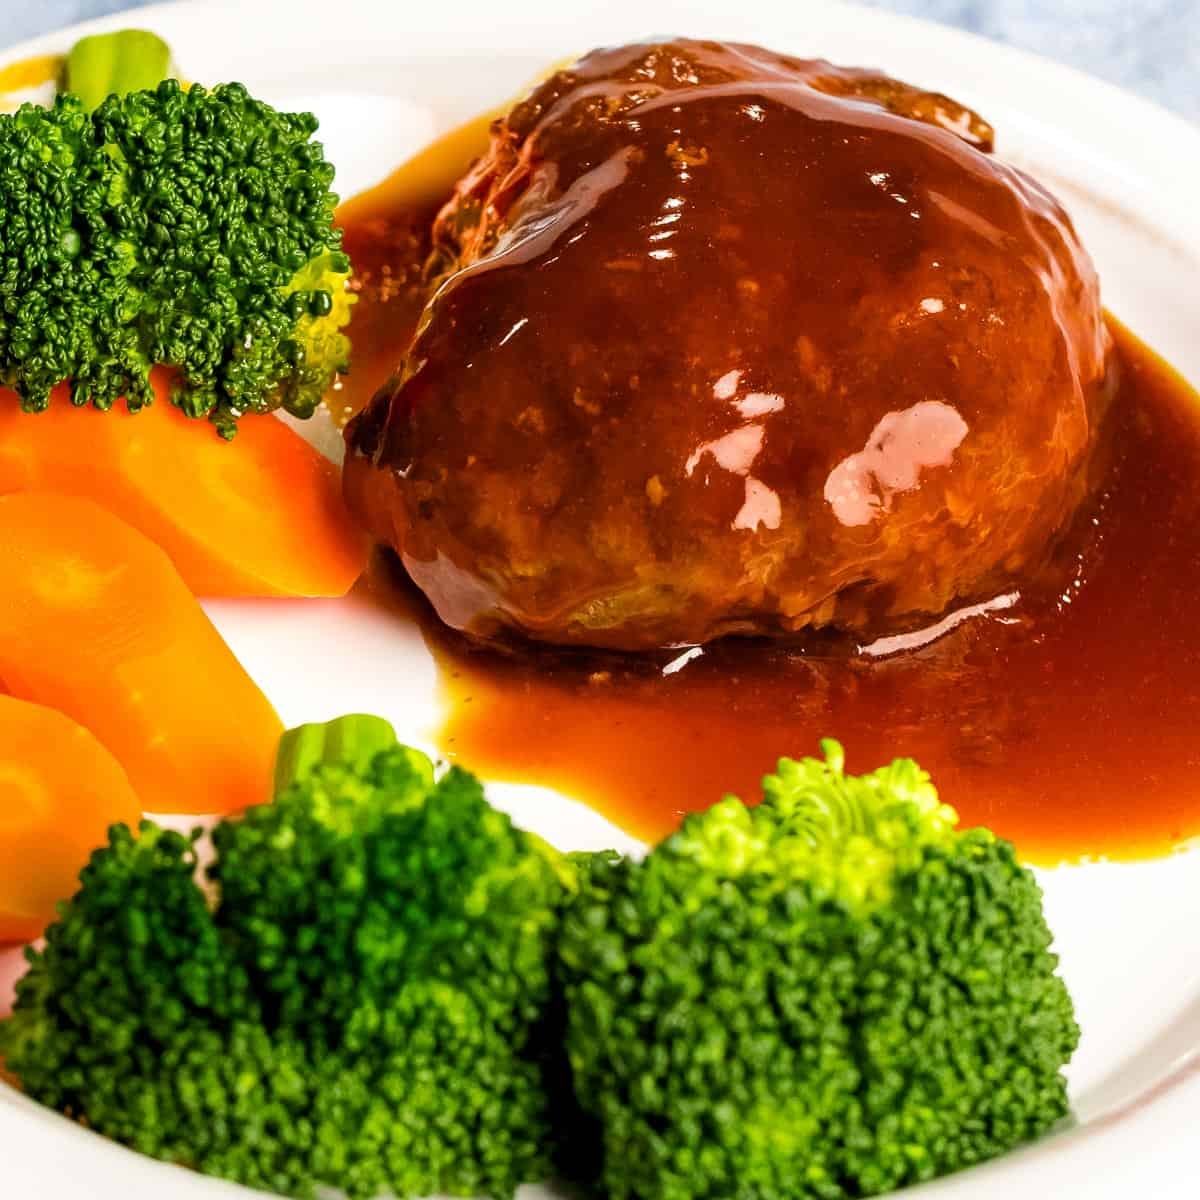 Japanese hamburger steak (hambāgu ハンバーグ) on a white plate next to broccoli and carrots.